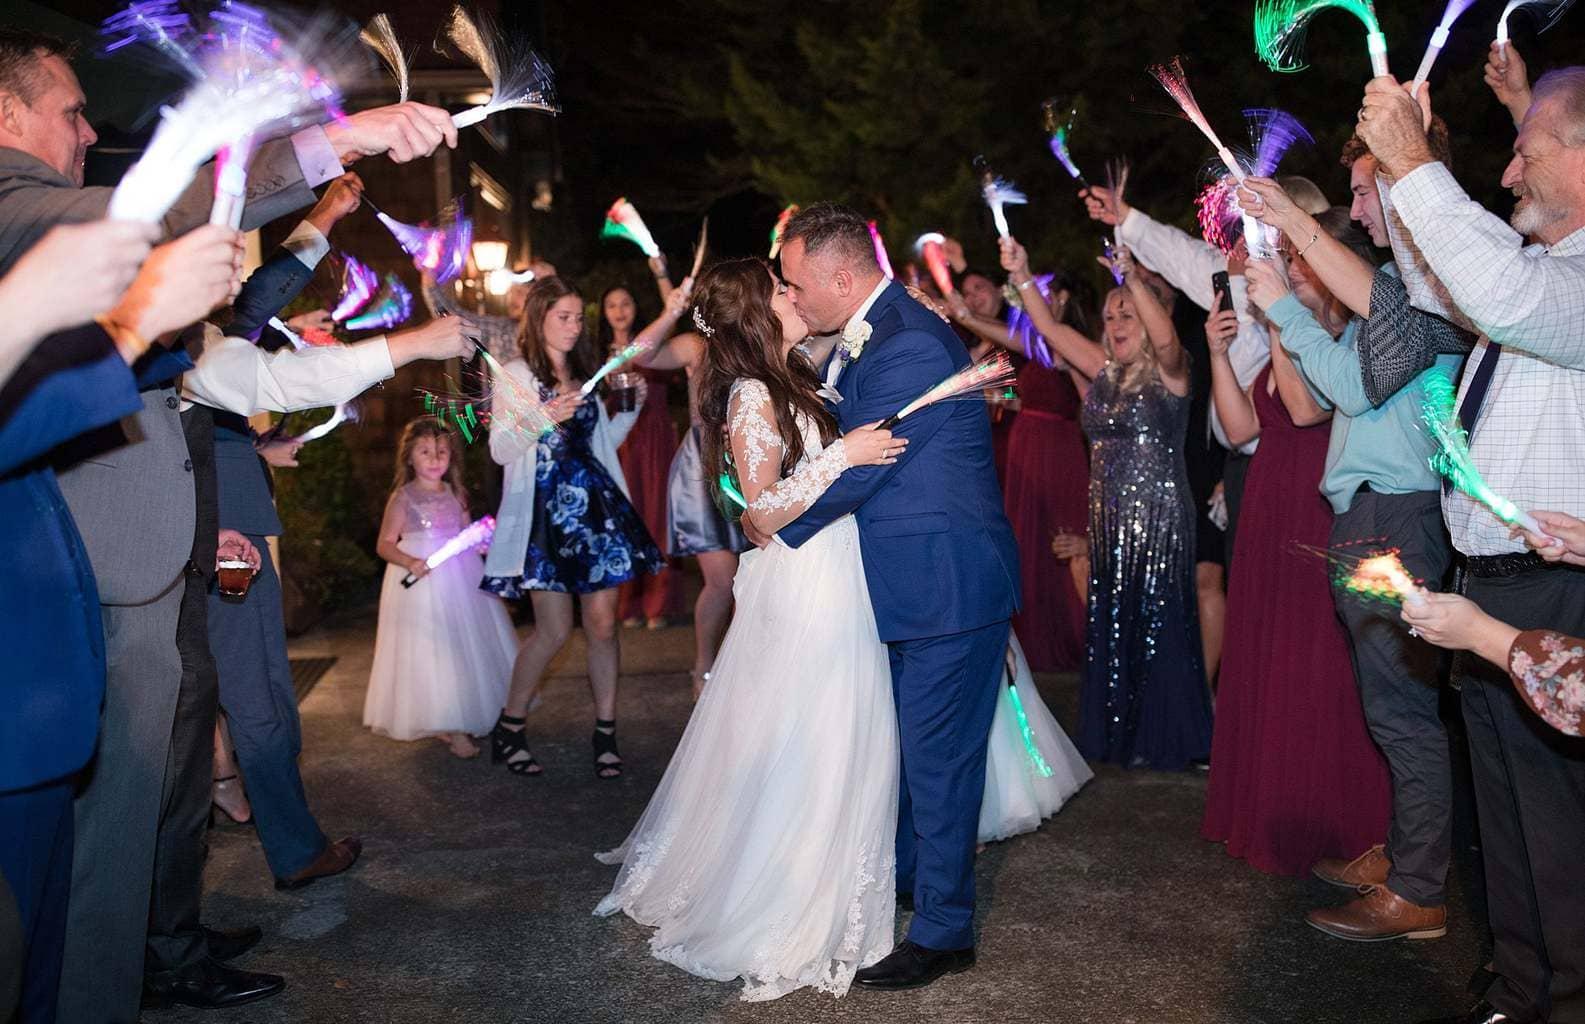 Final grand send off wedding exit